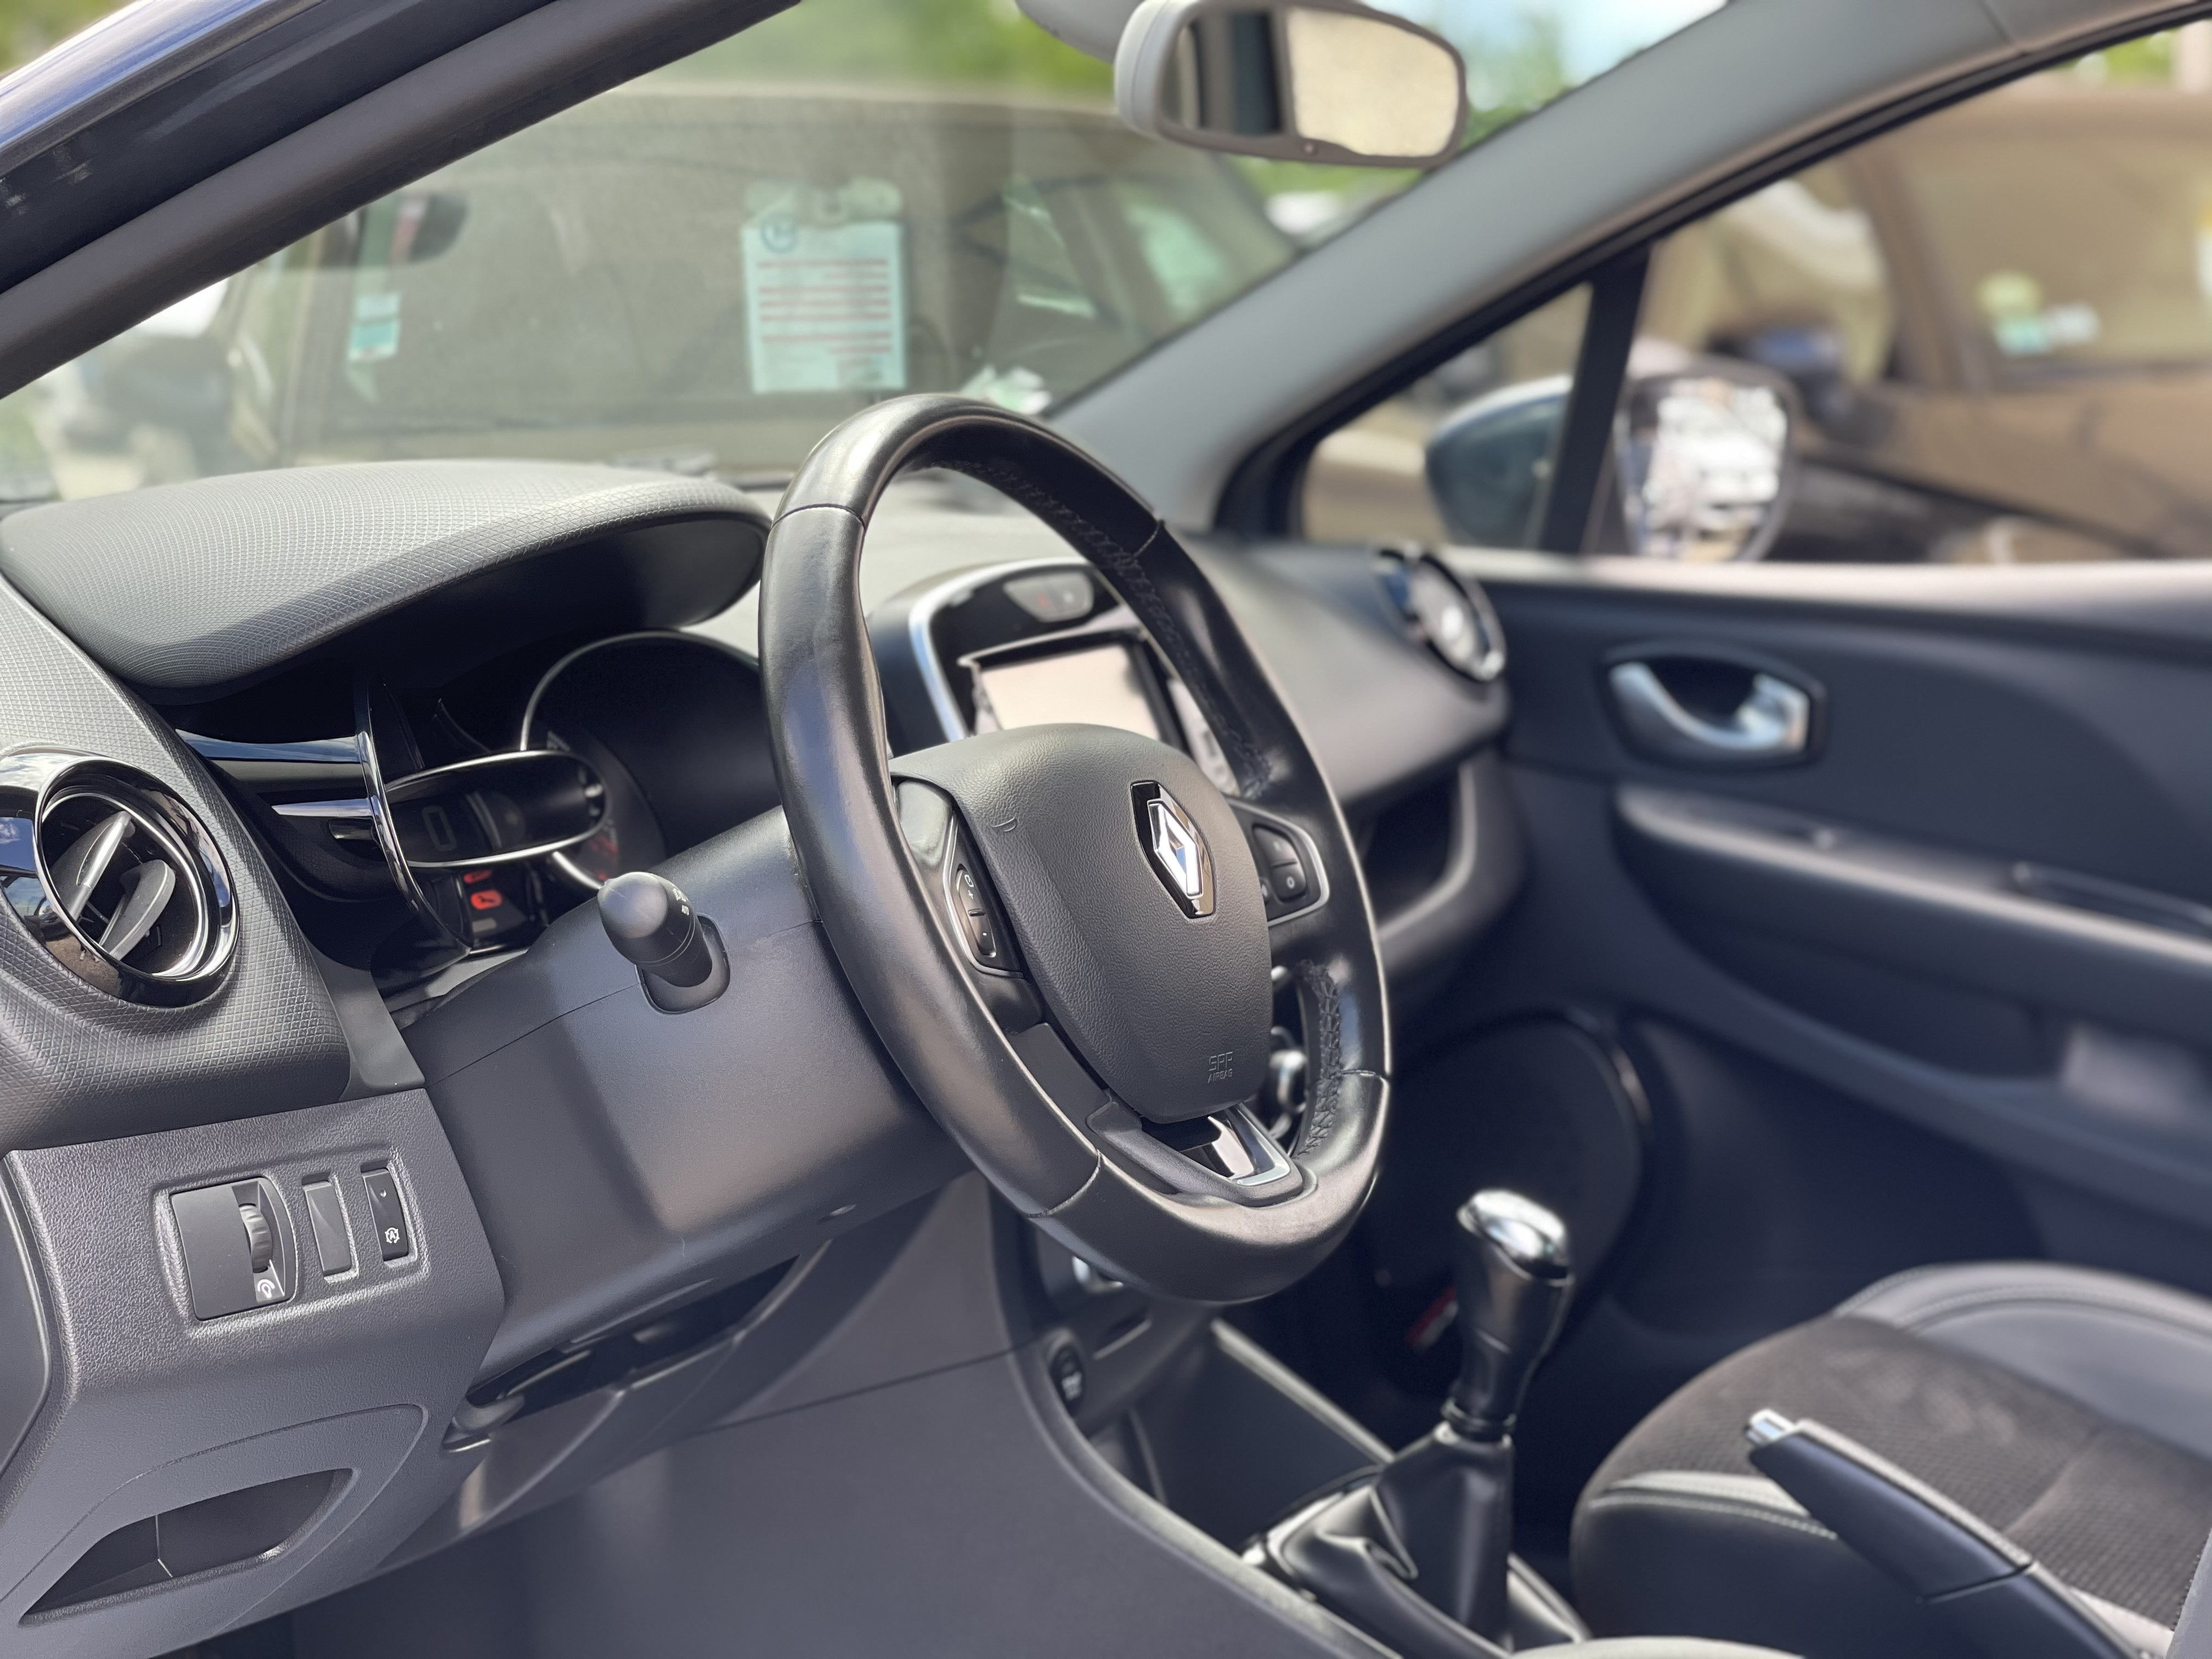 Renault Clio IV 1 5 dCi 90ch energy Intens 5p